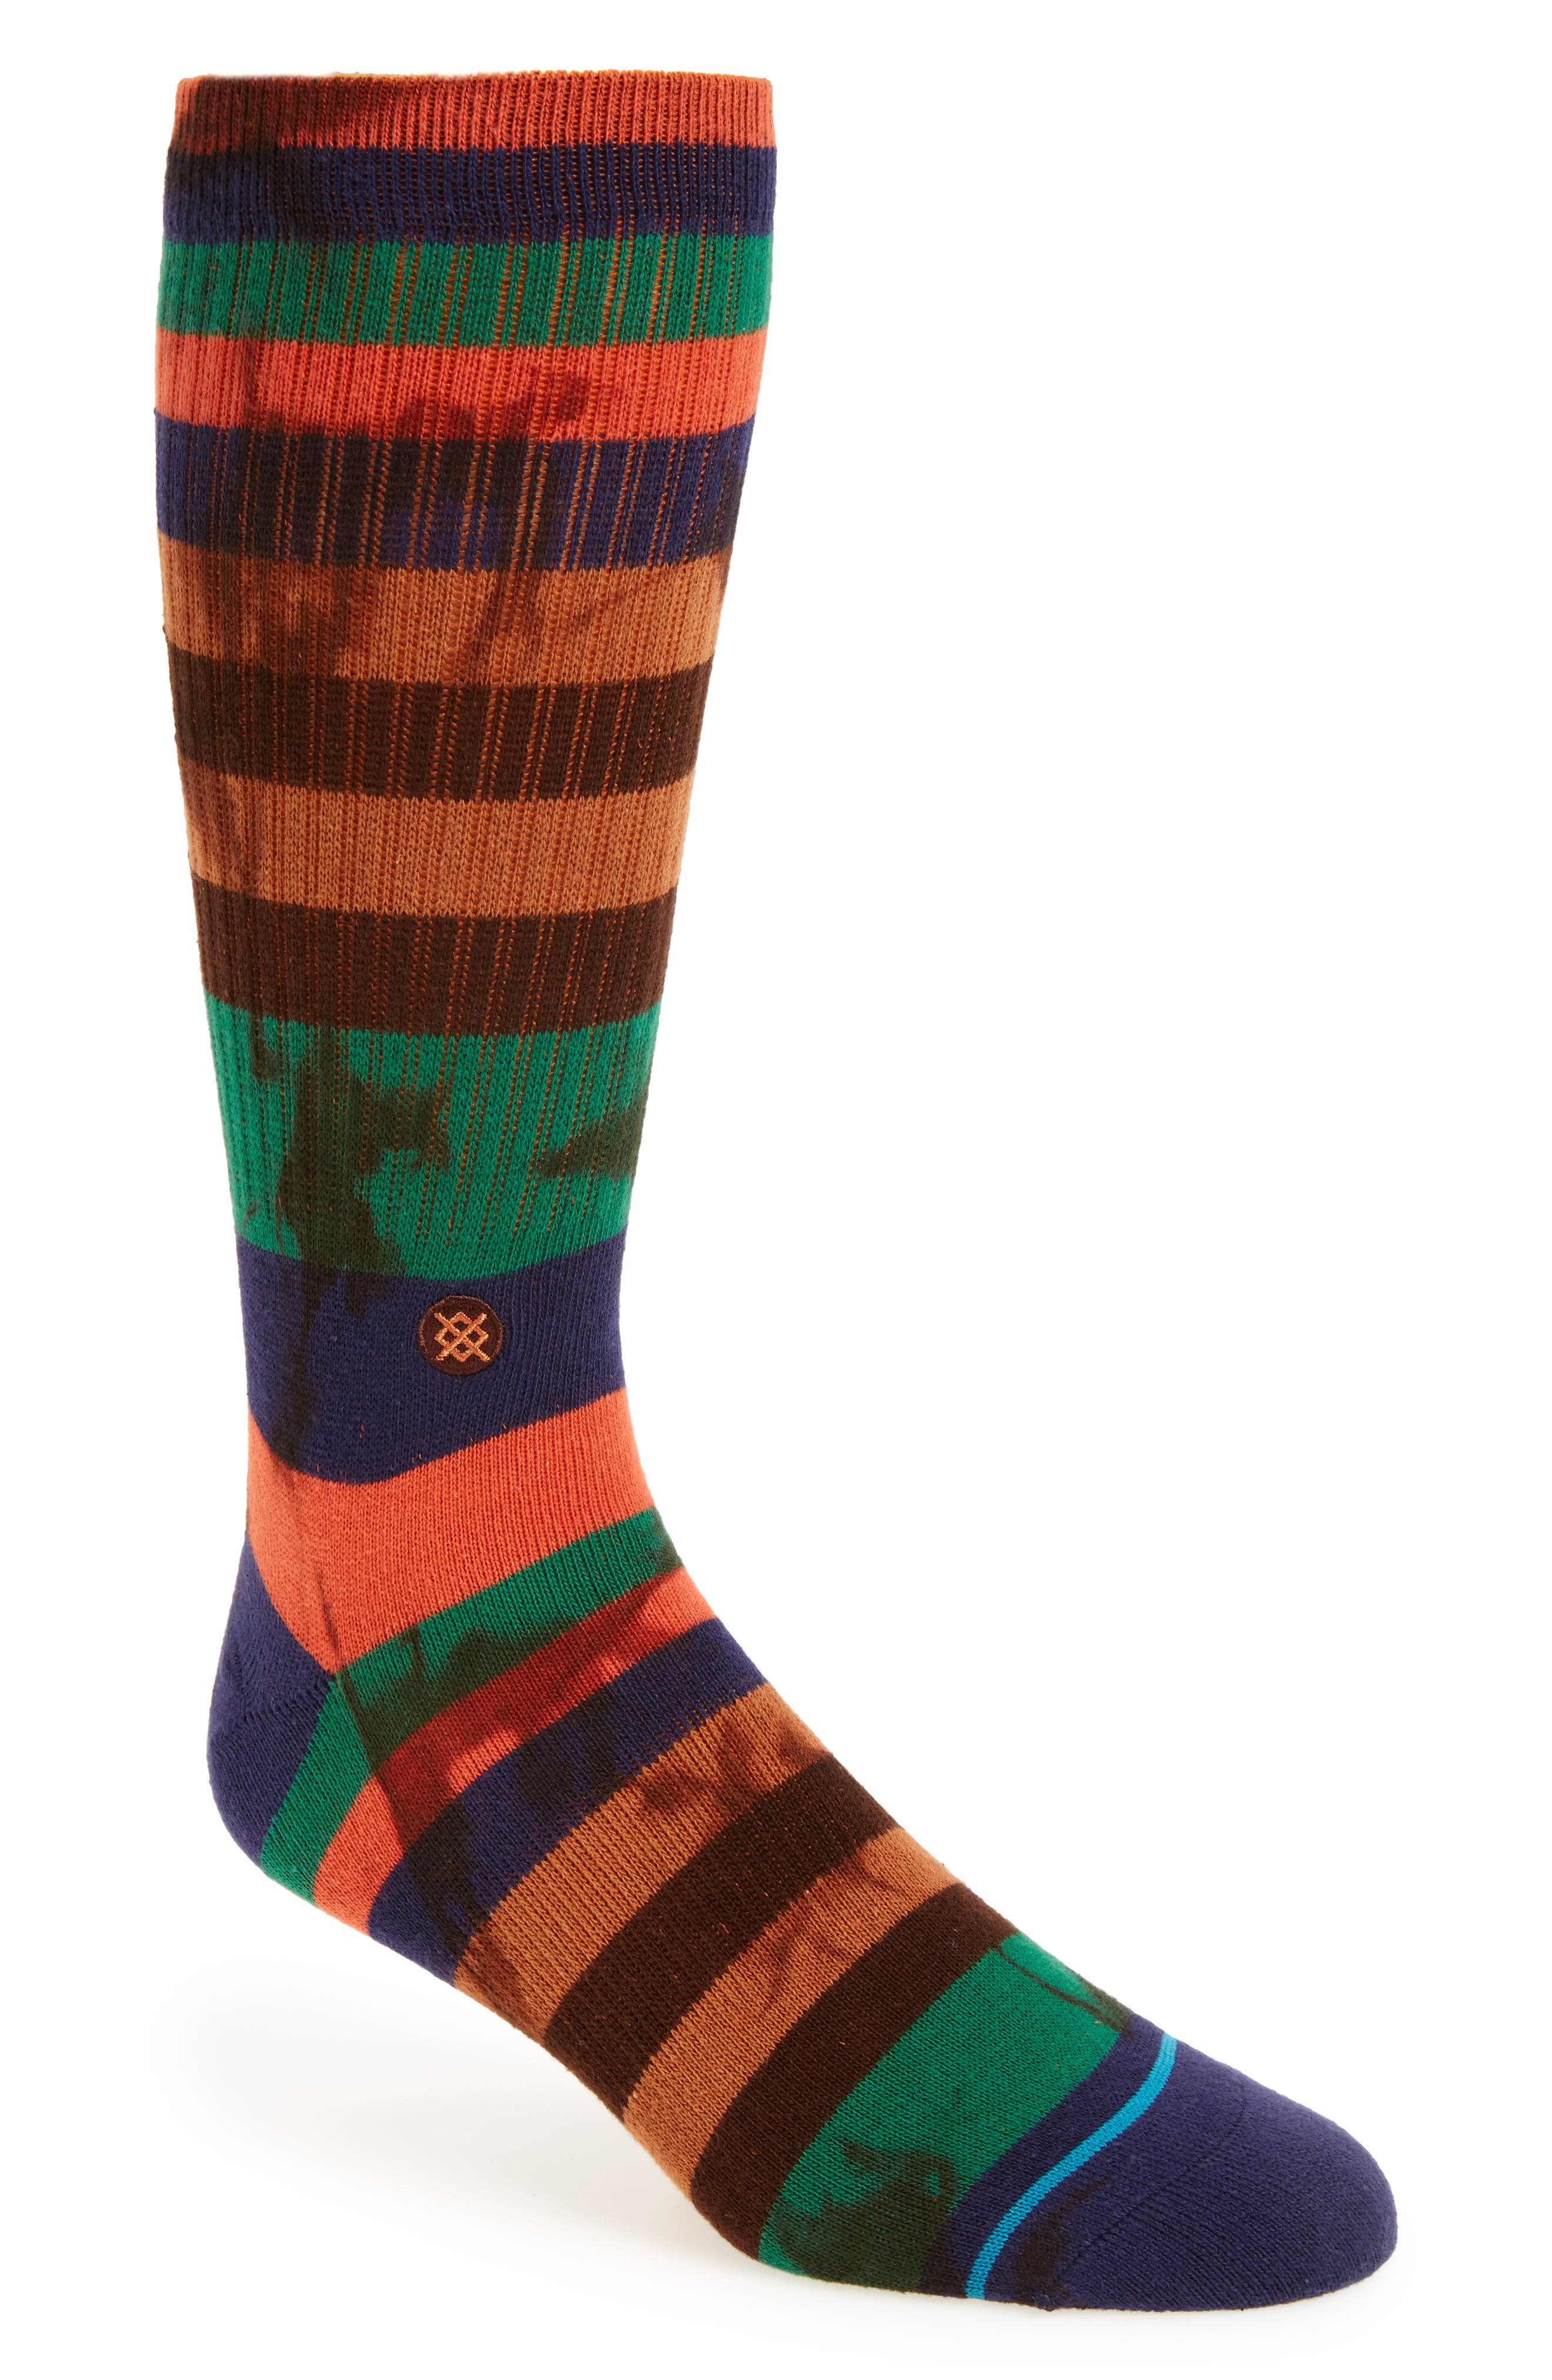 Alternate Image 1 Selected - Stance Otay 2 Crew Socks